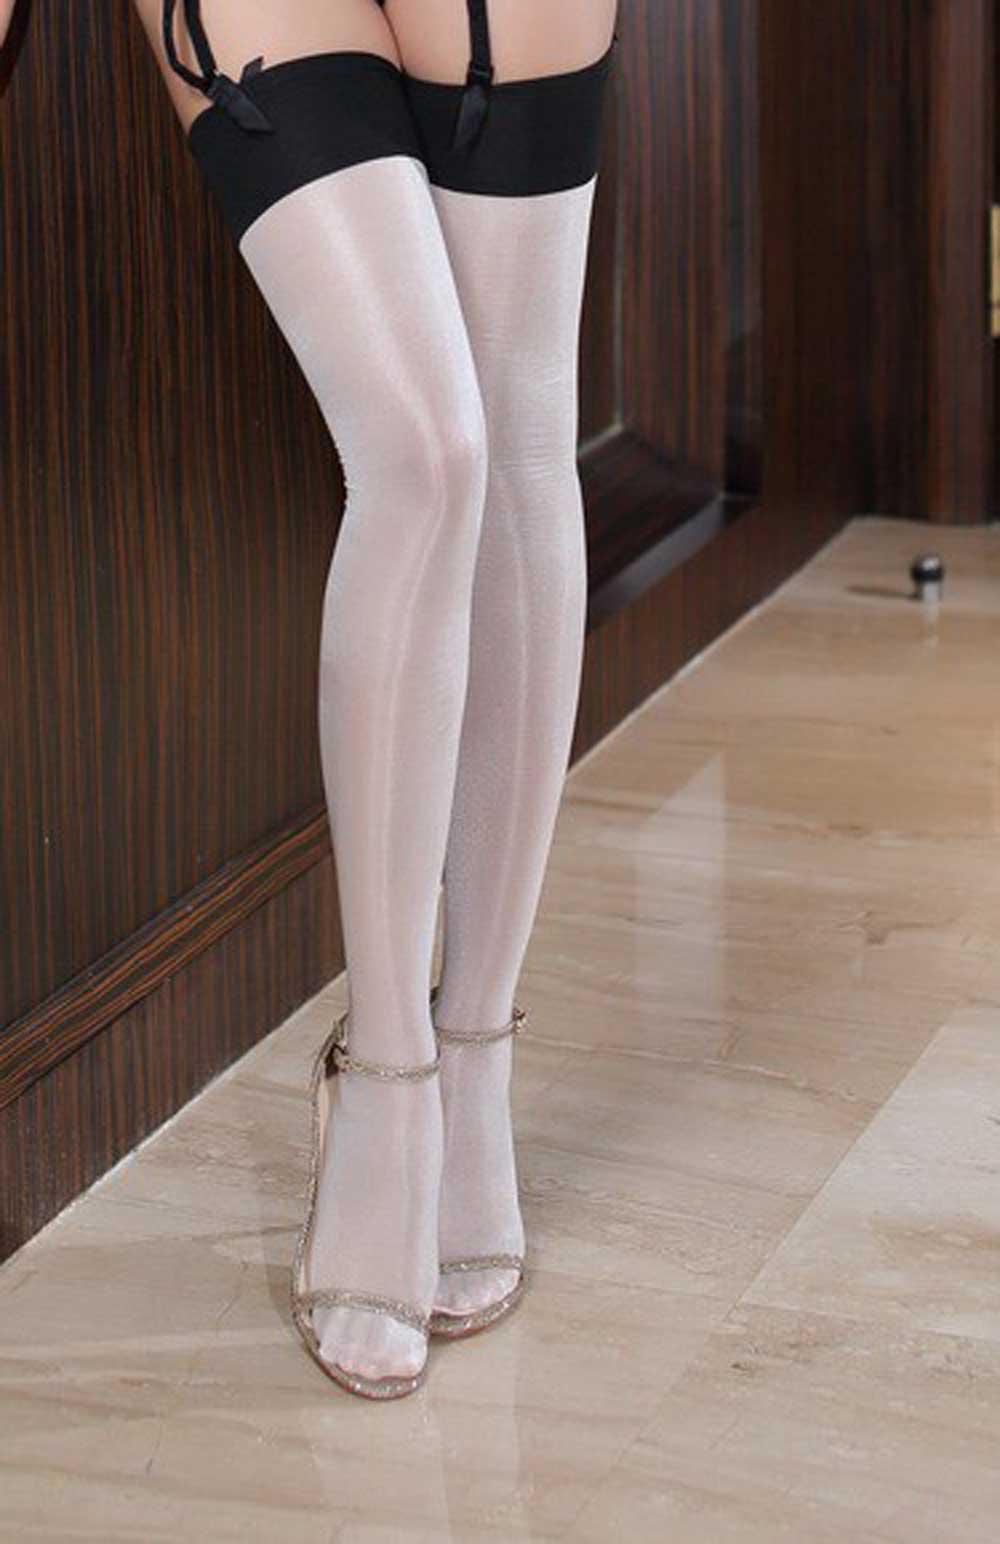 Pantyhose nylon stockings history